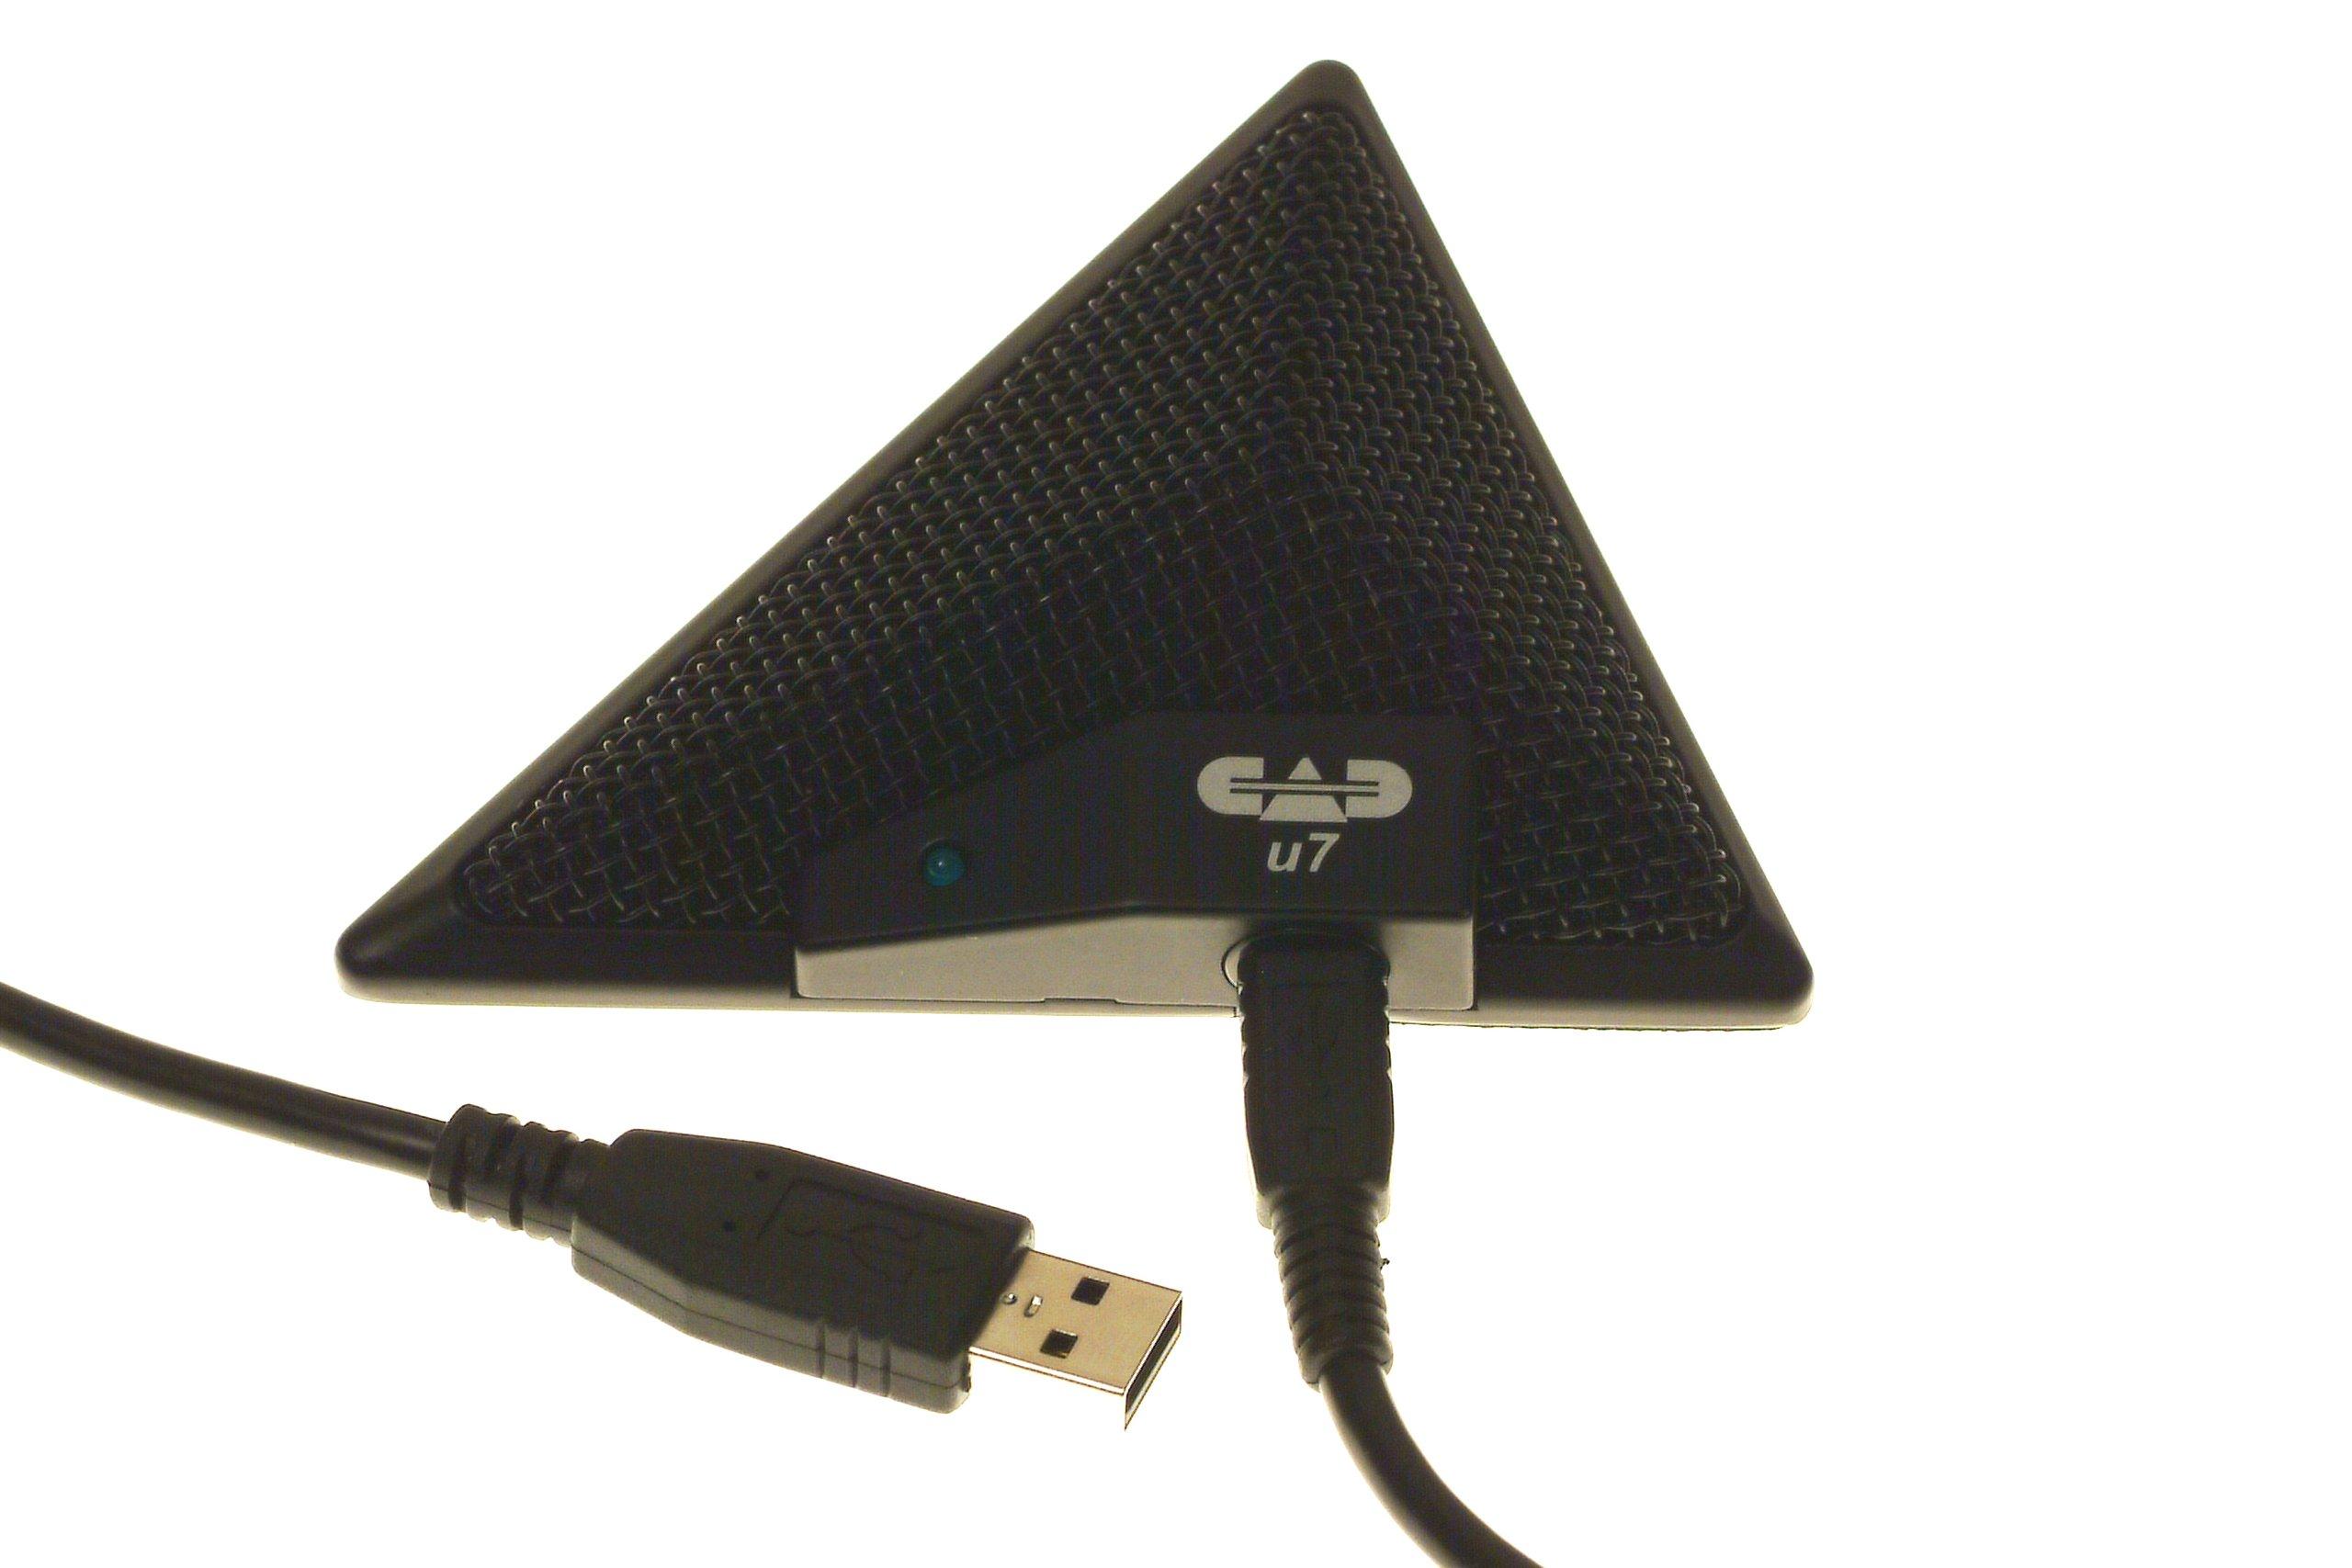 CAD Audio USB U7 Boundary Omnidirectional Condenser Microphone